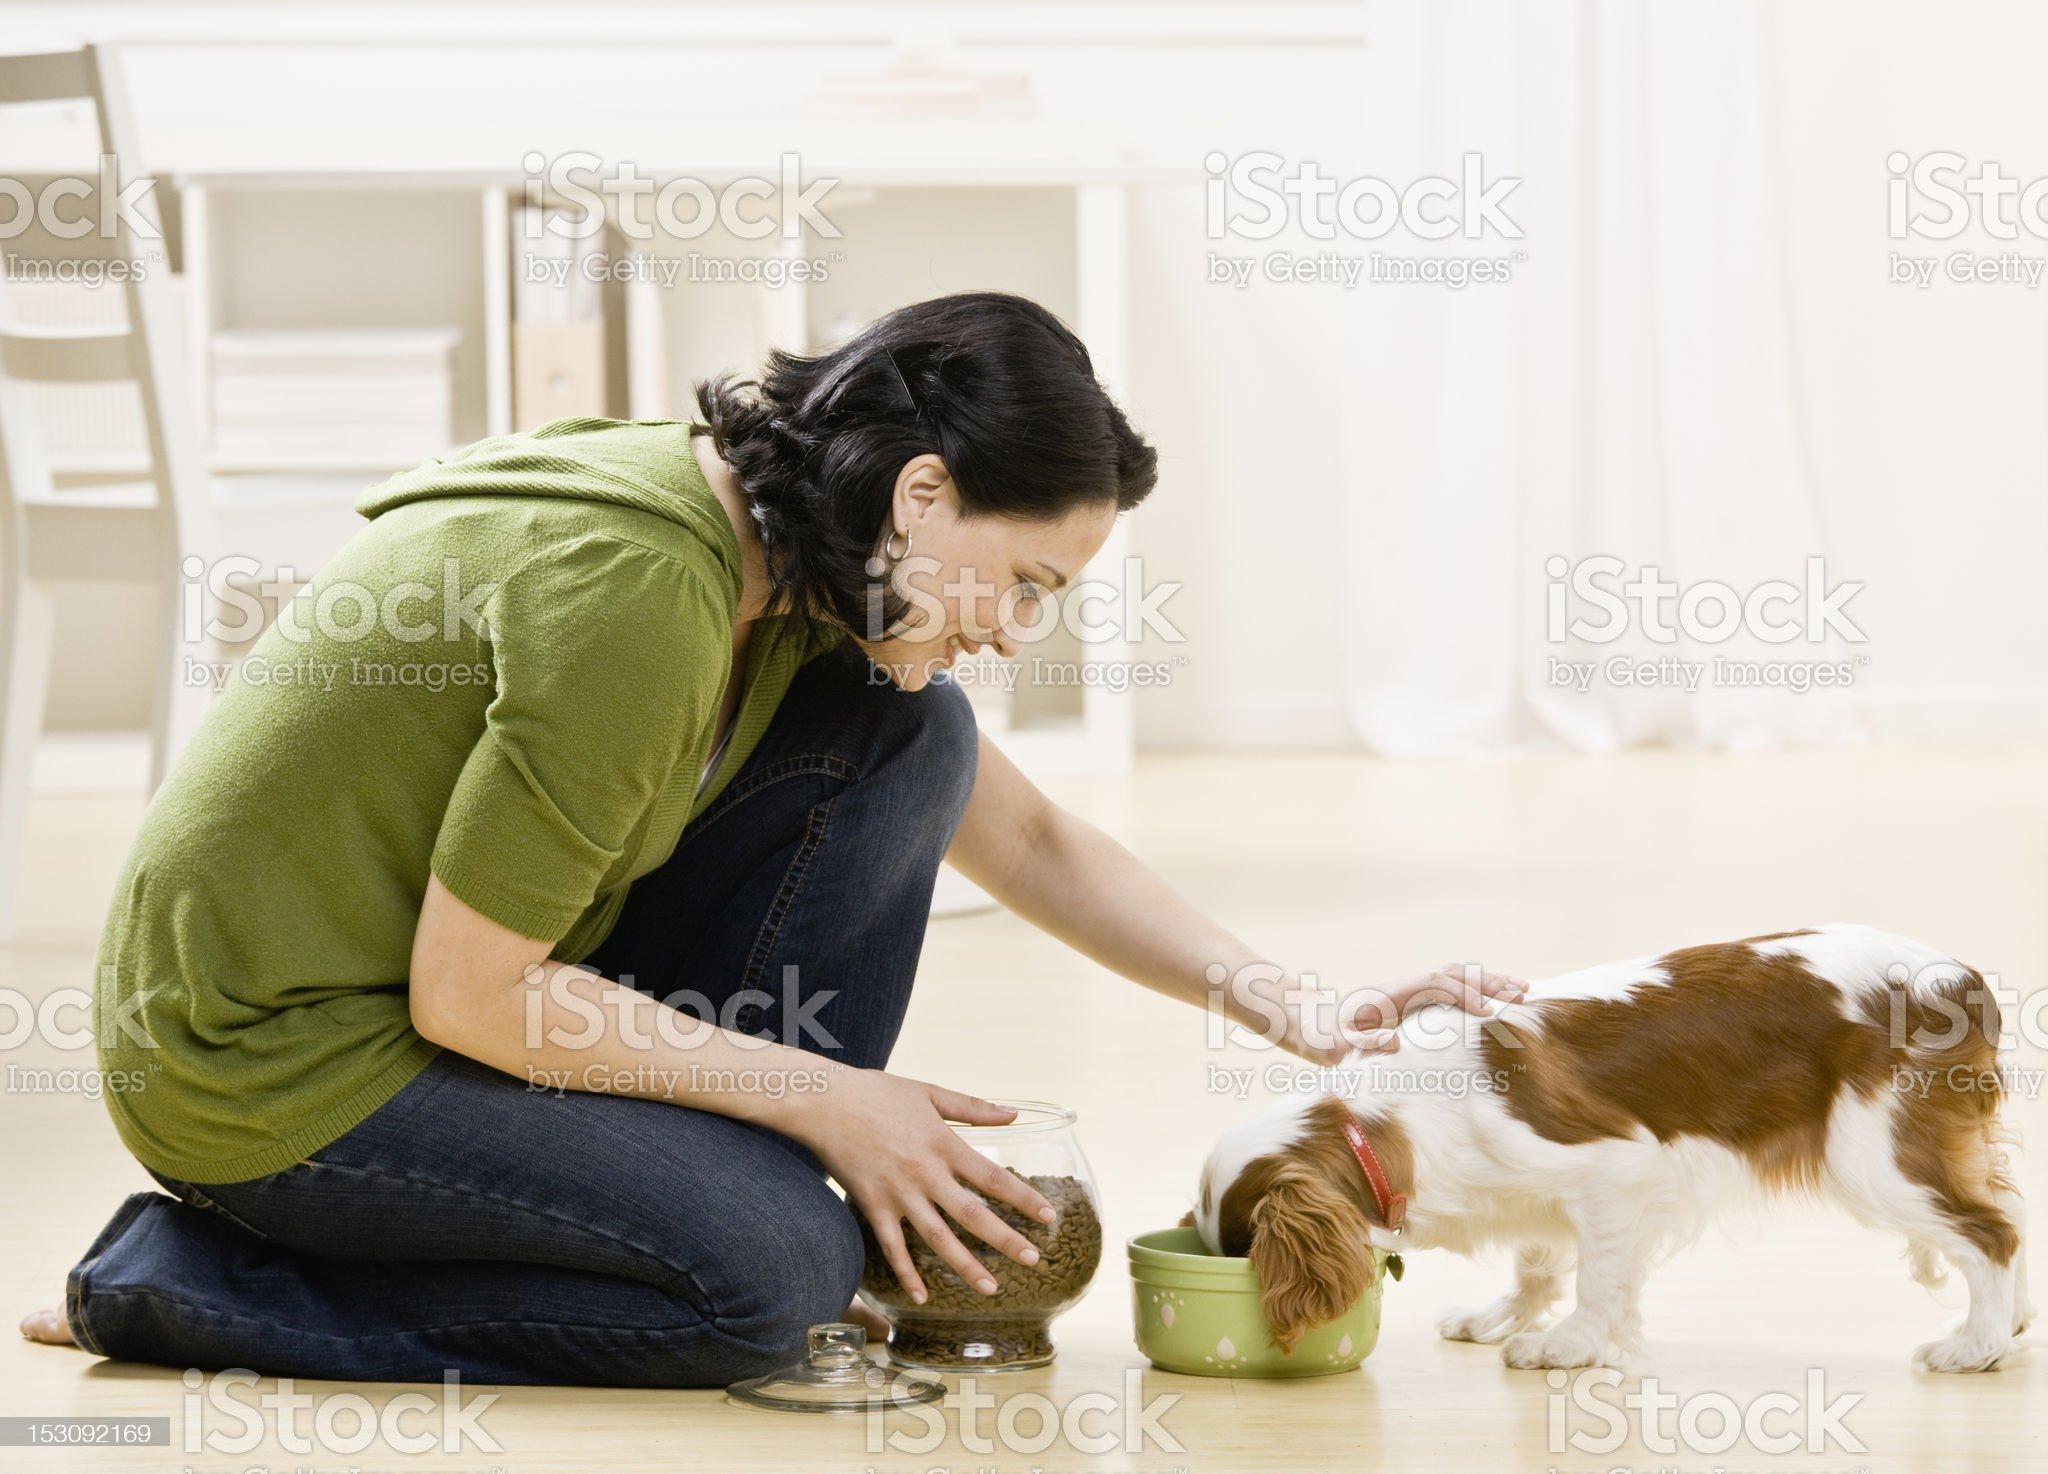 Woman Feeding Puppy royalty-free stock photo